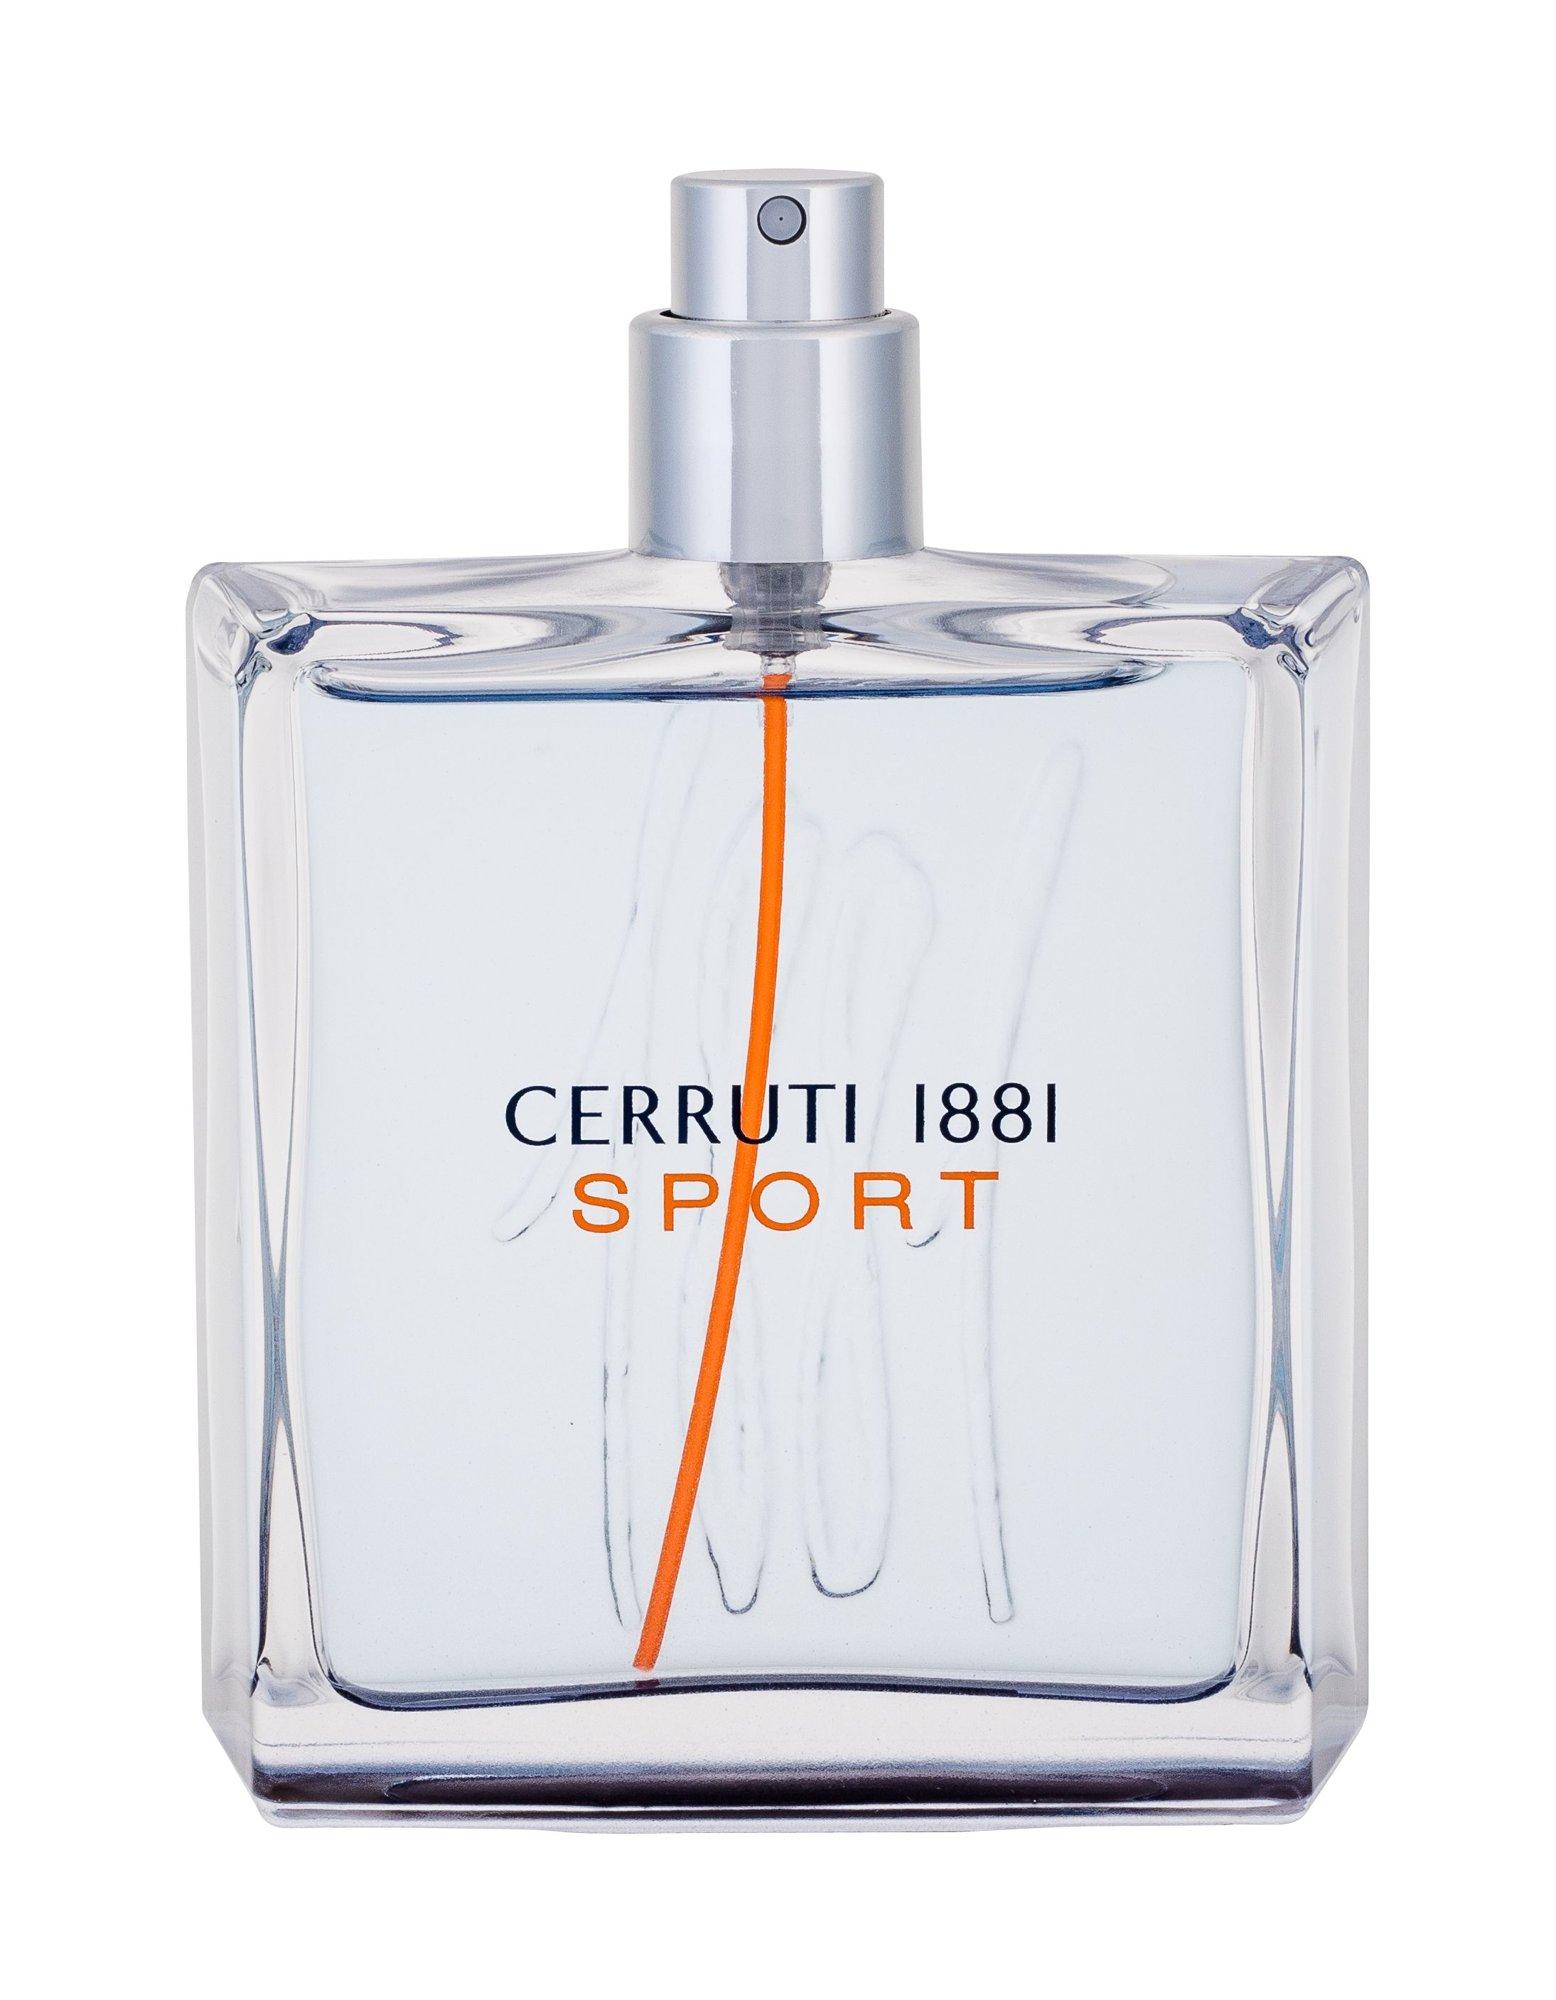 Kvepalai Nino Cerruti Cerruti 1881 Sport